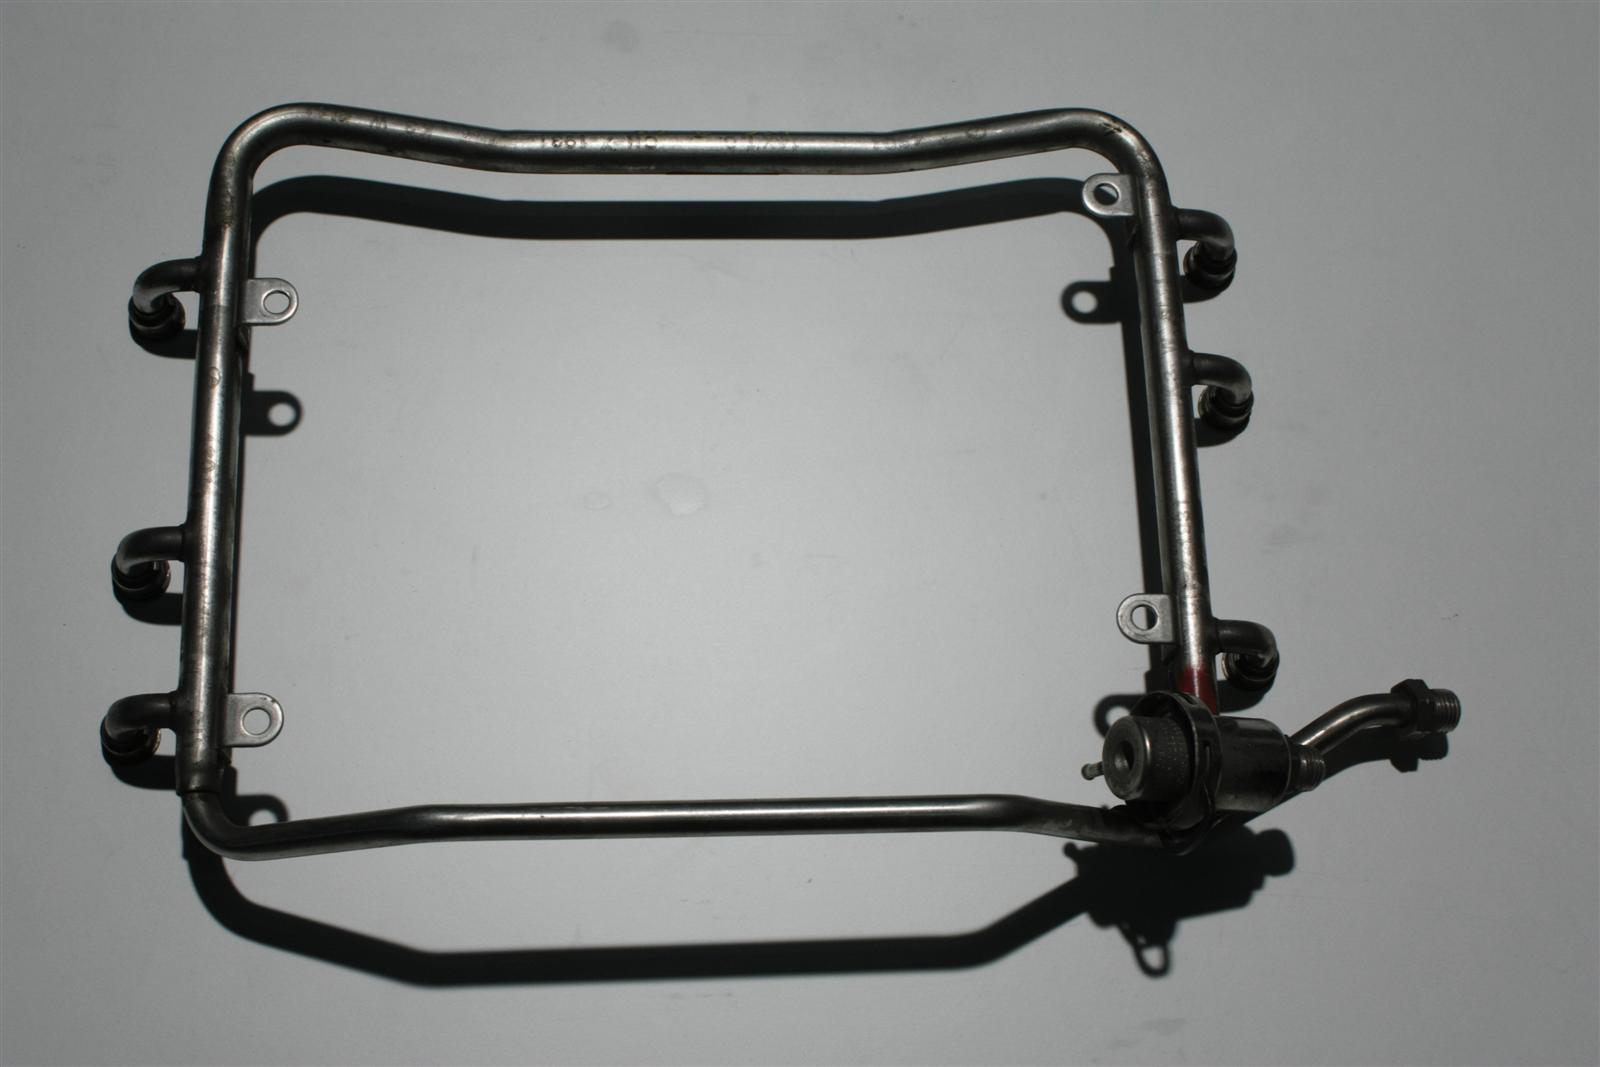 Audi 80 B4/A8 D2 2.6-2.8l 150-174PS Einspritzleiste + Benzindruckregler